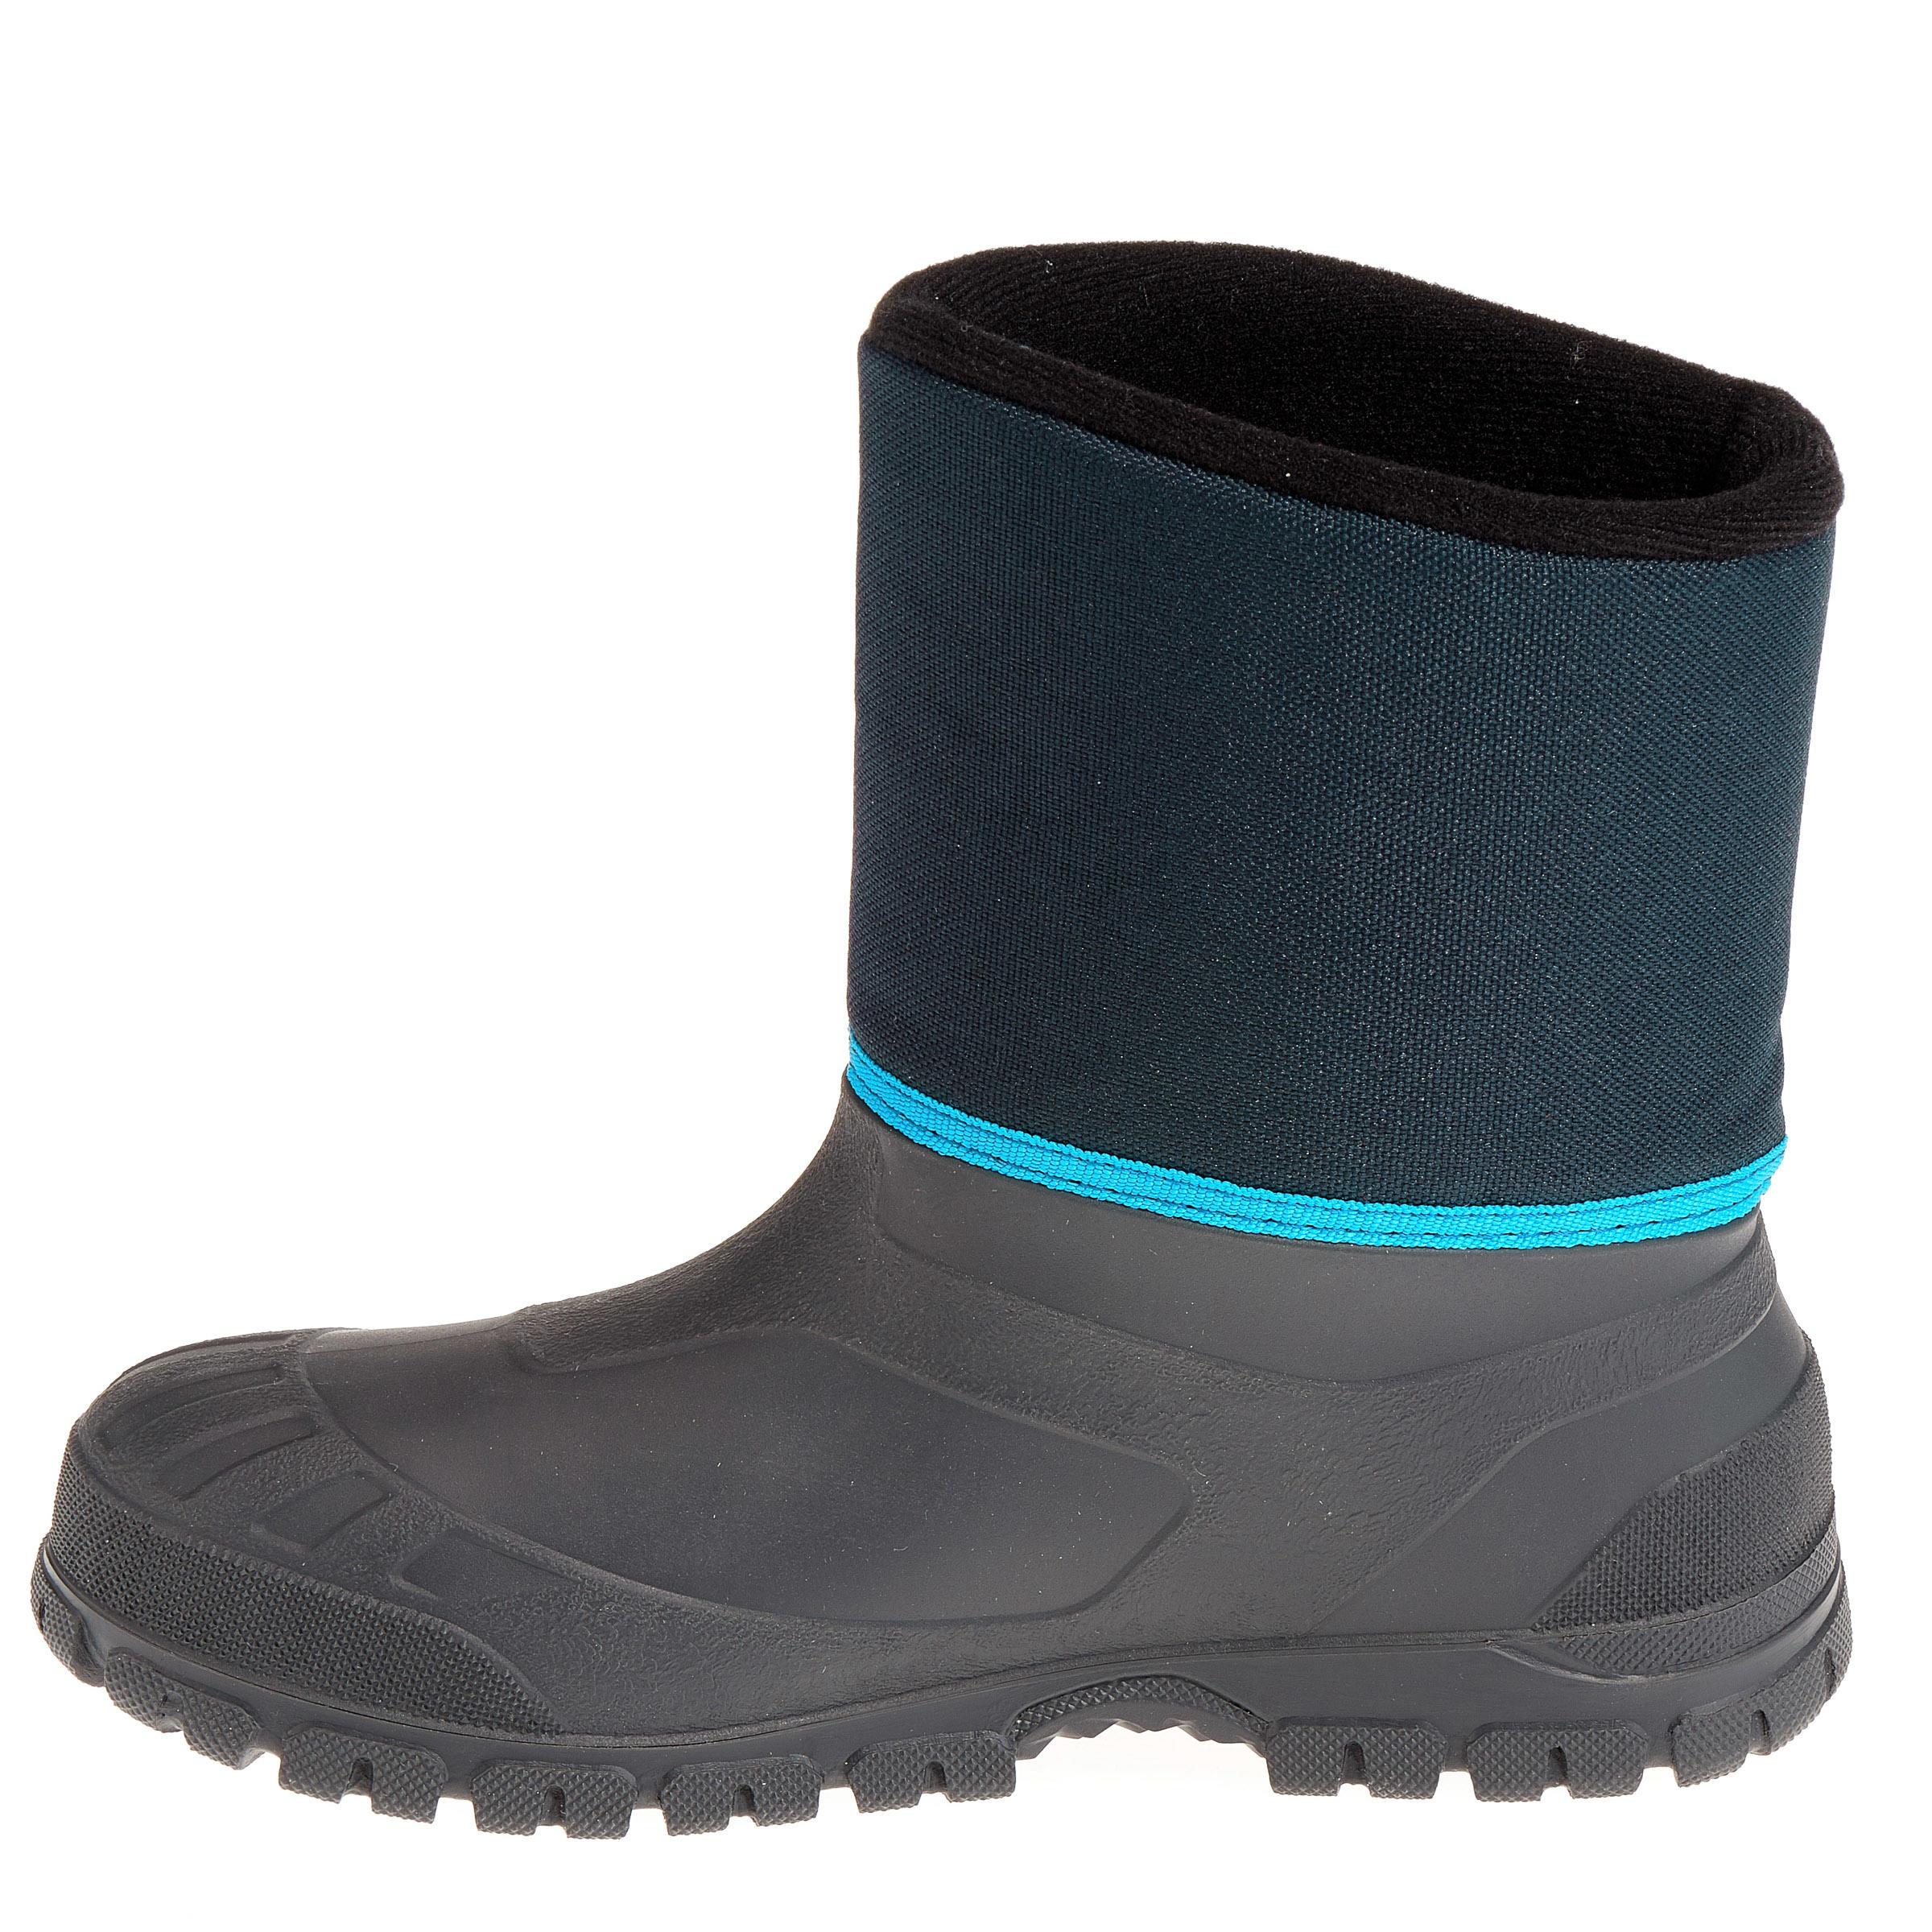 SH100 Warm Child's Snow Hiking Pants - Blue